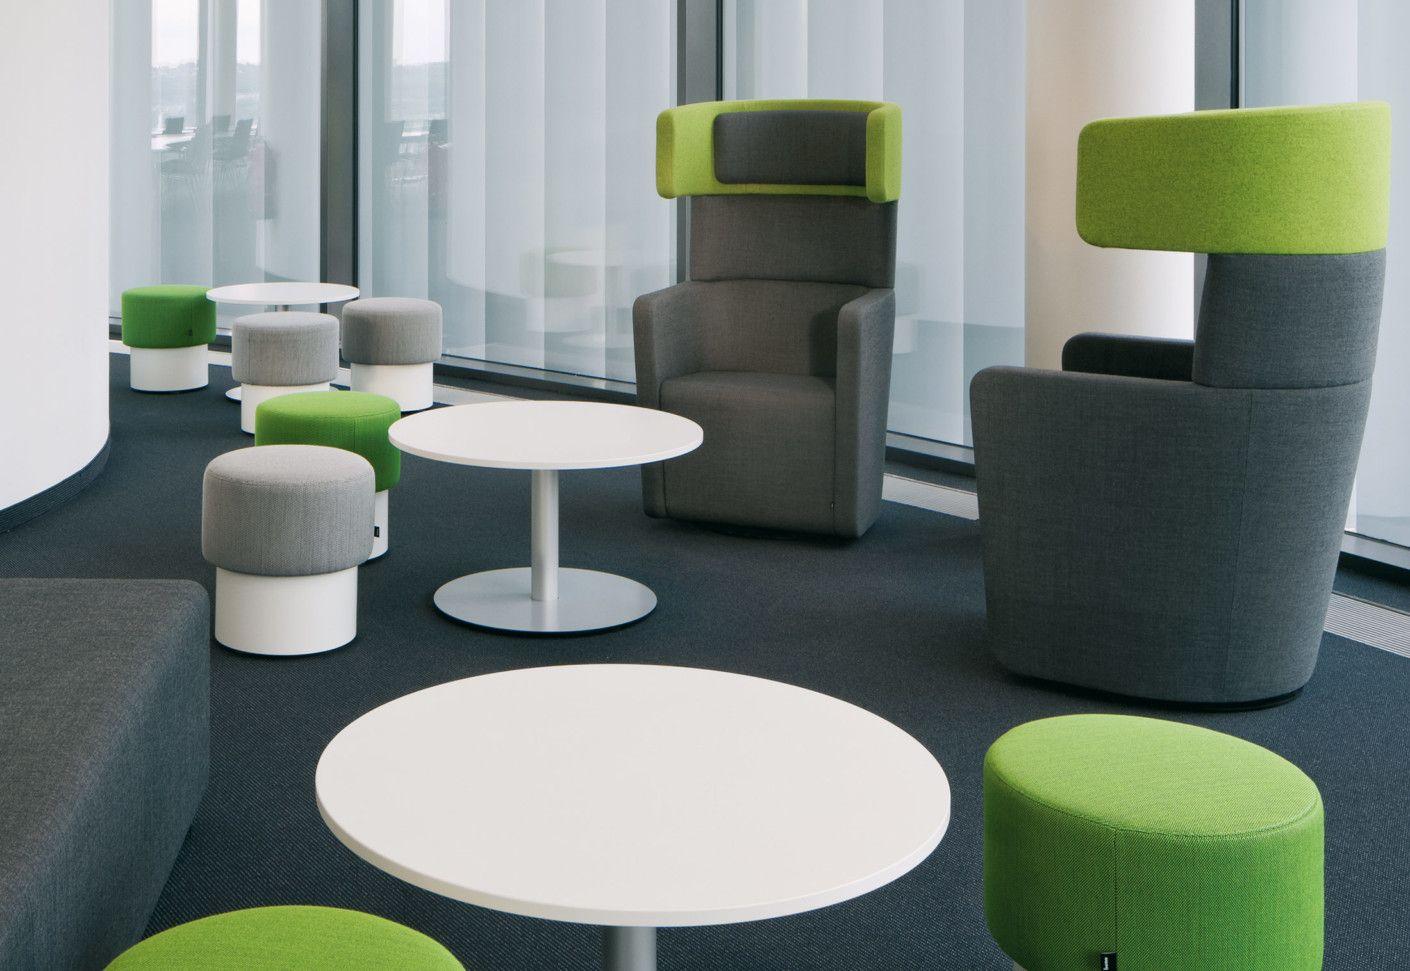 Parcs By Pearsonlloyd For Bene Bene Office Furniture   Design Diseño ...